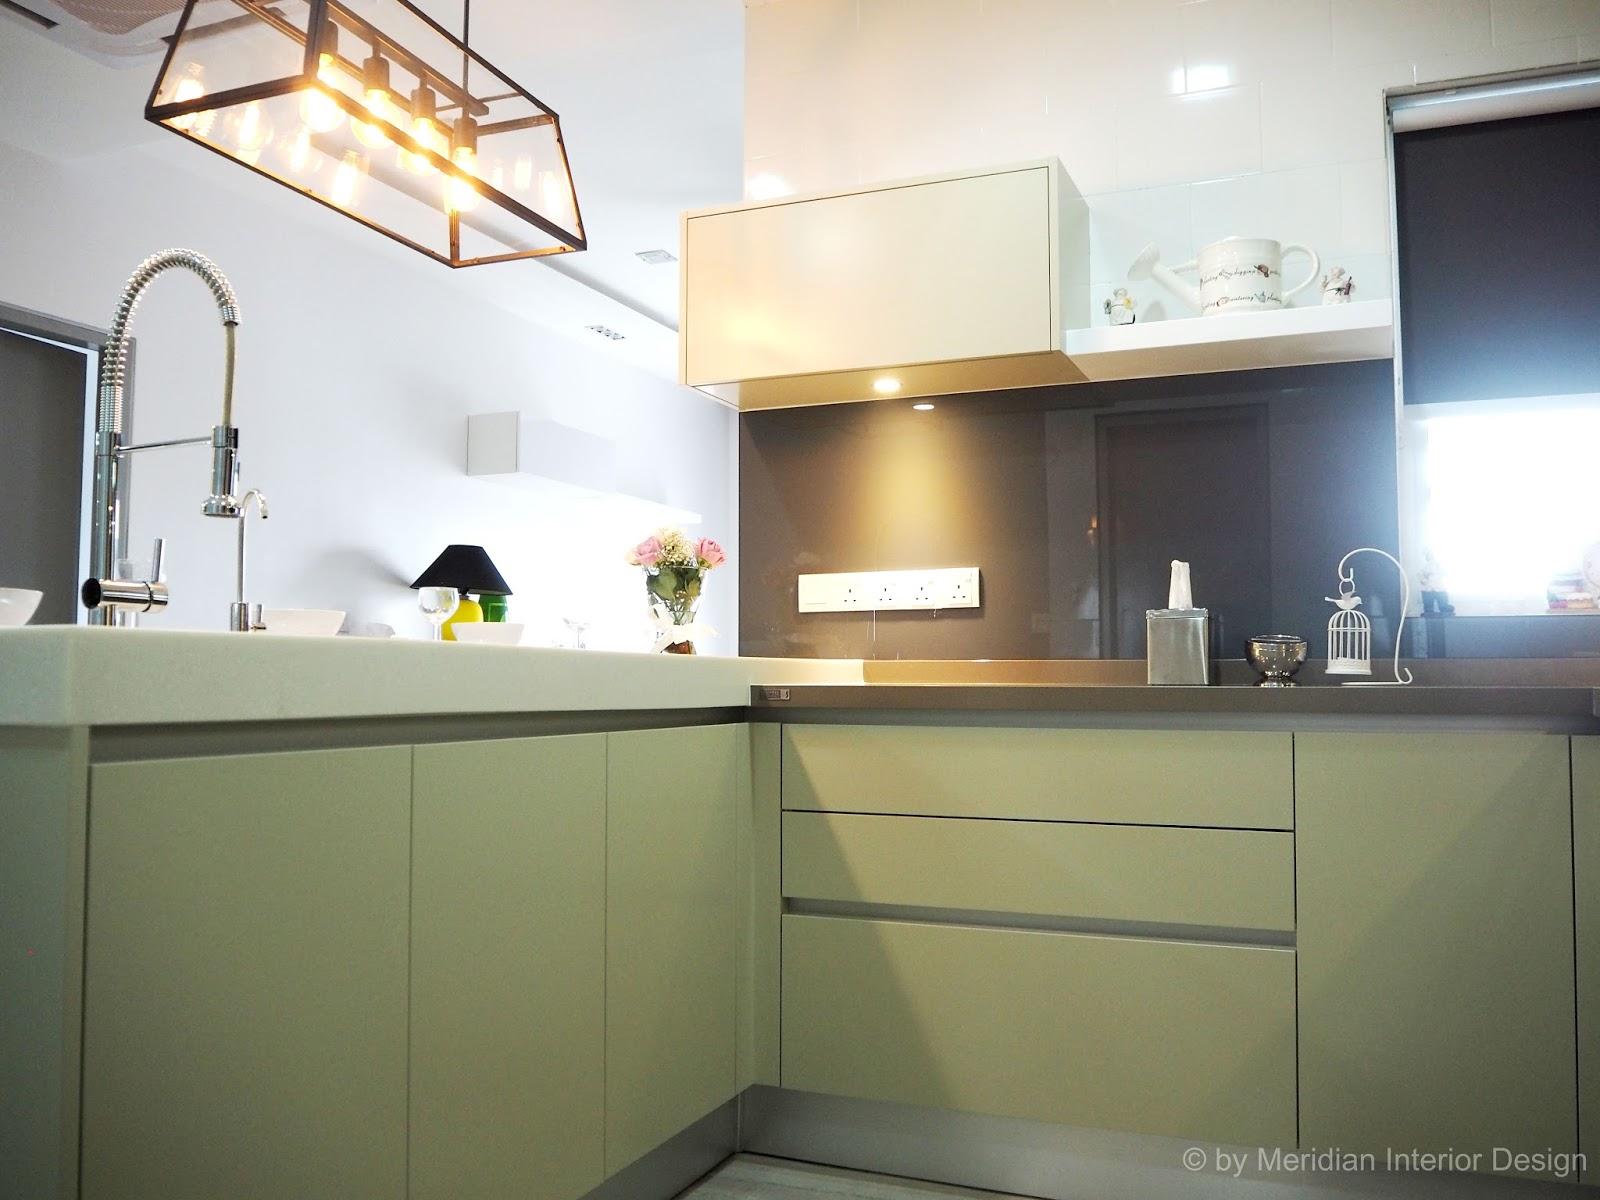 Signature Kitchen Cabinets Signature Kitchen Cabinets Price